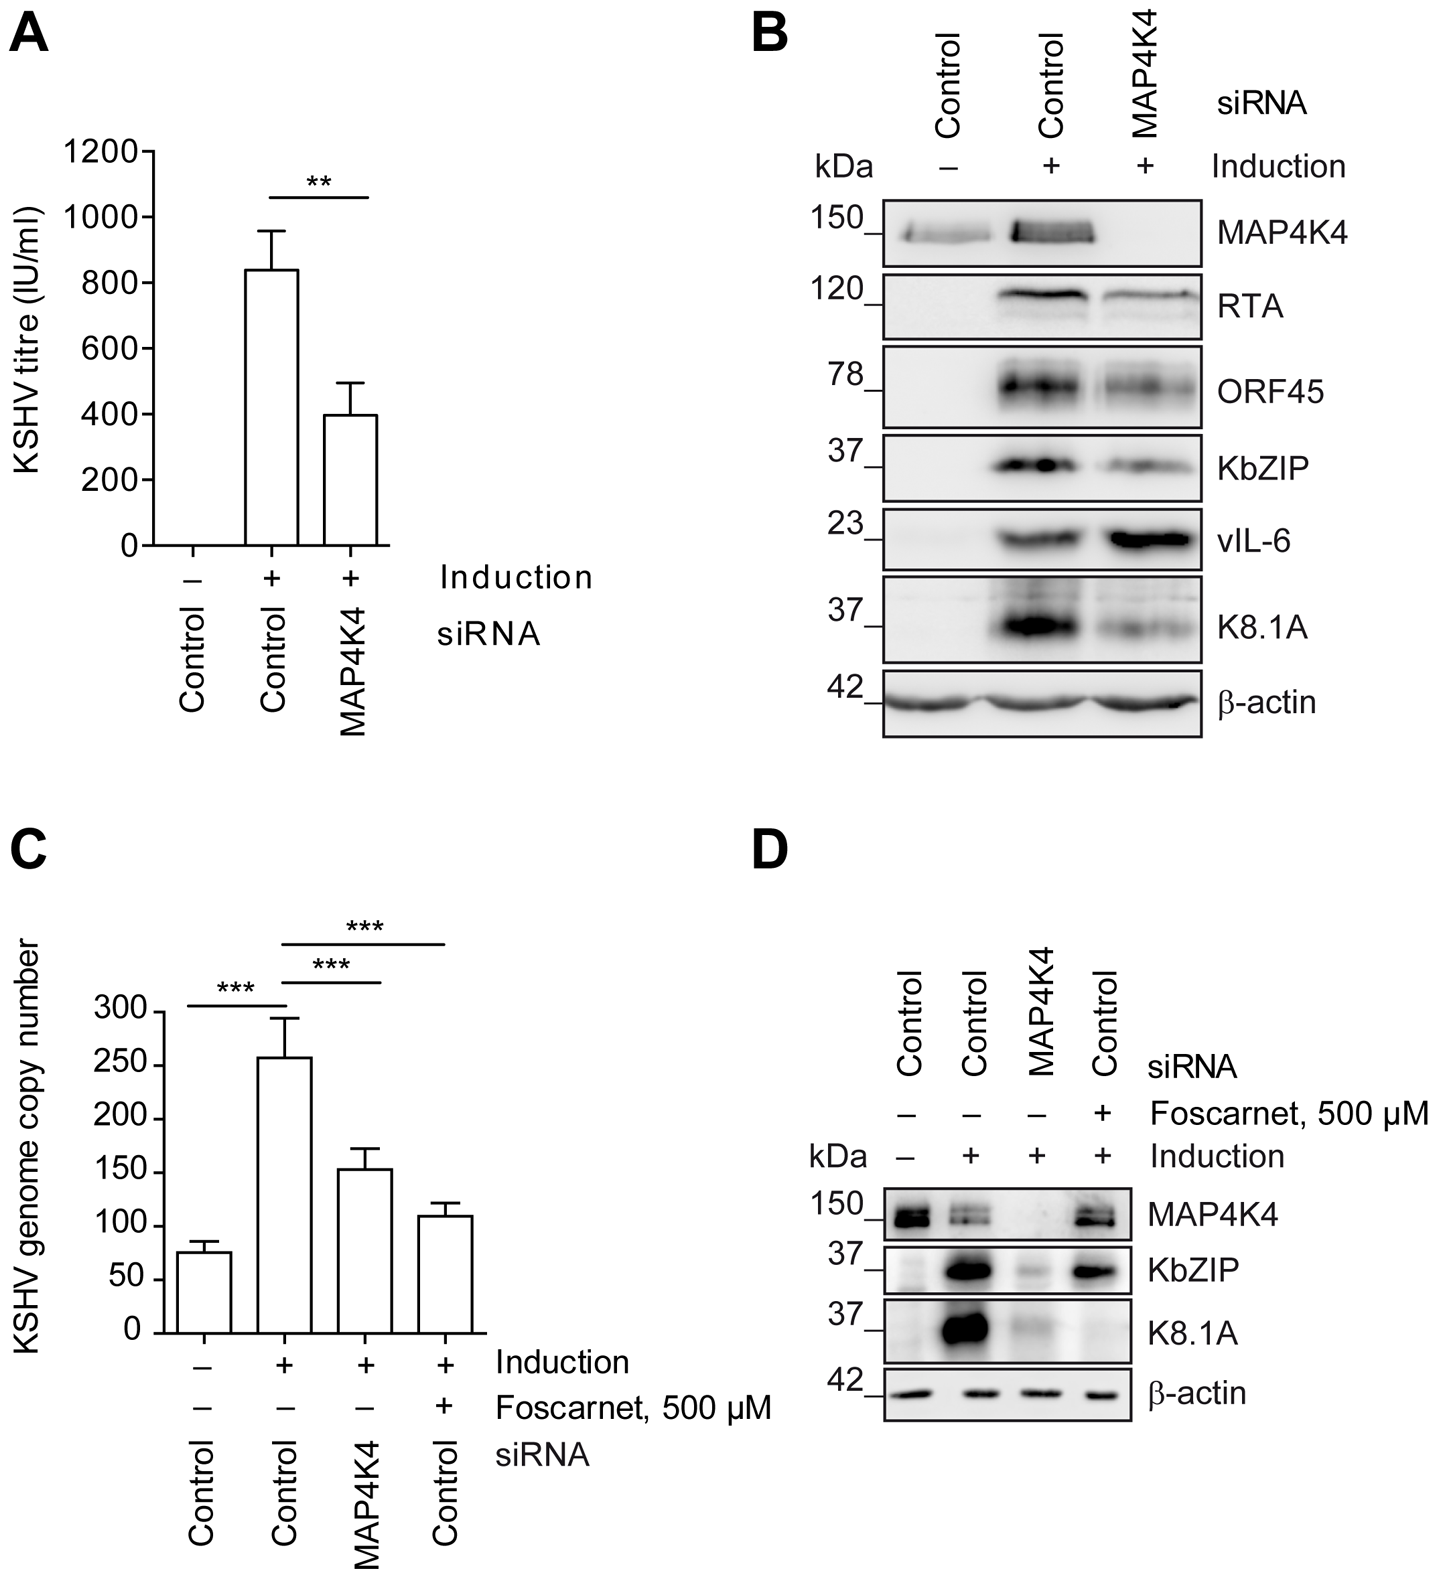 MAP4K4 promotes the lytic reactivation of KSHV.